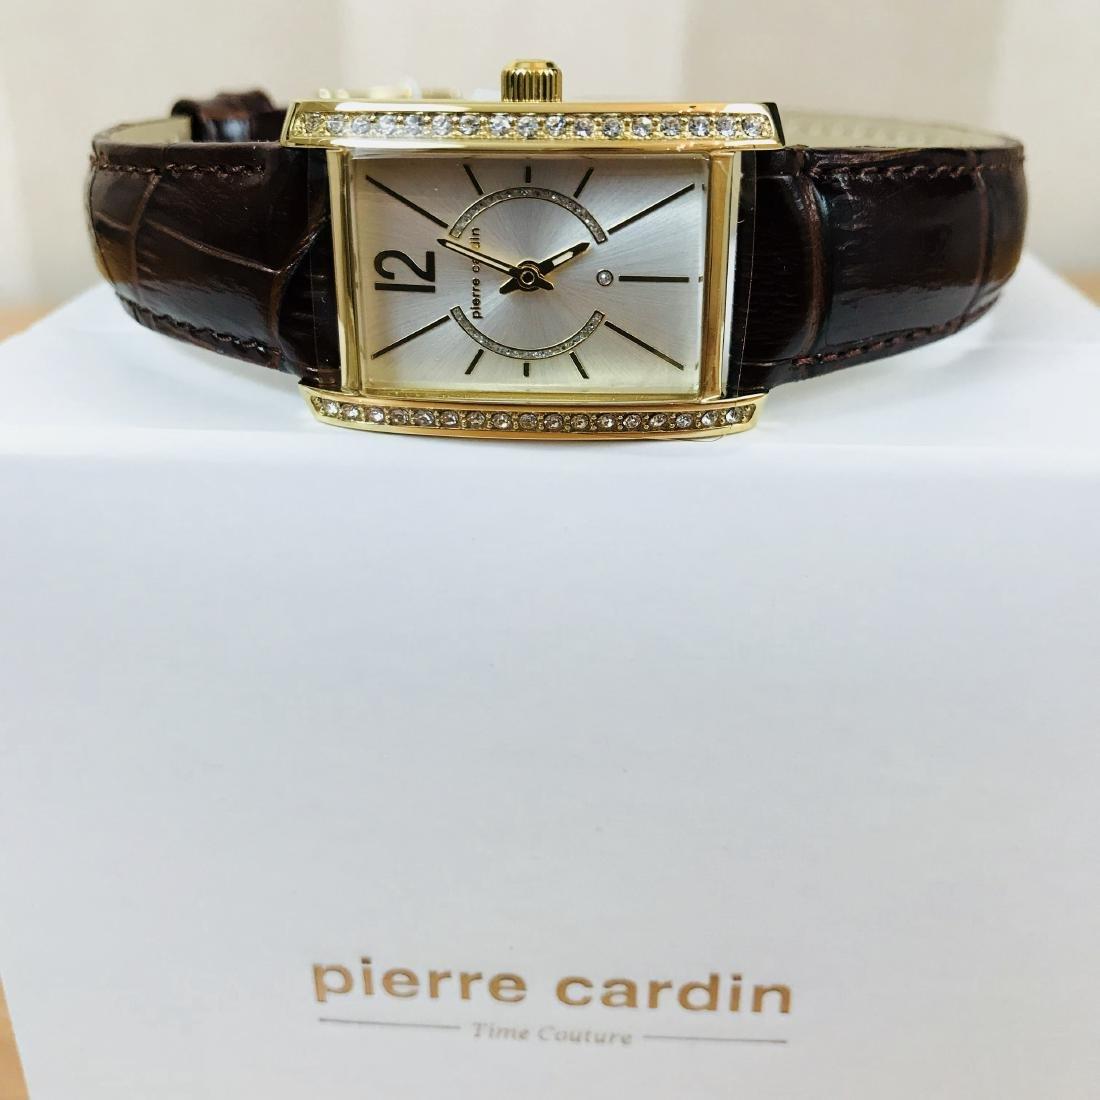 Pierre Cardin – Ladies Classic Stainless Steel Watch